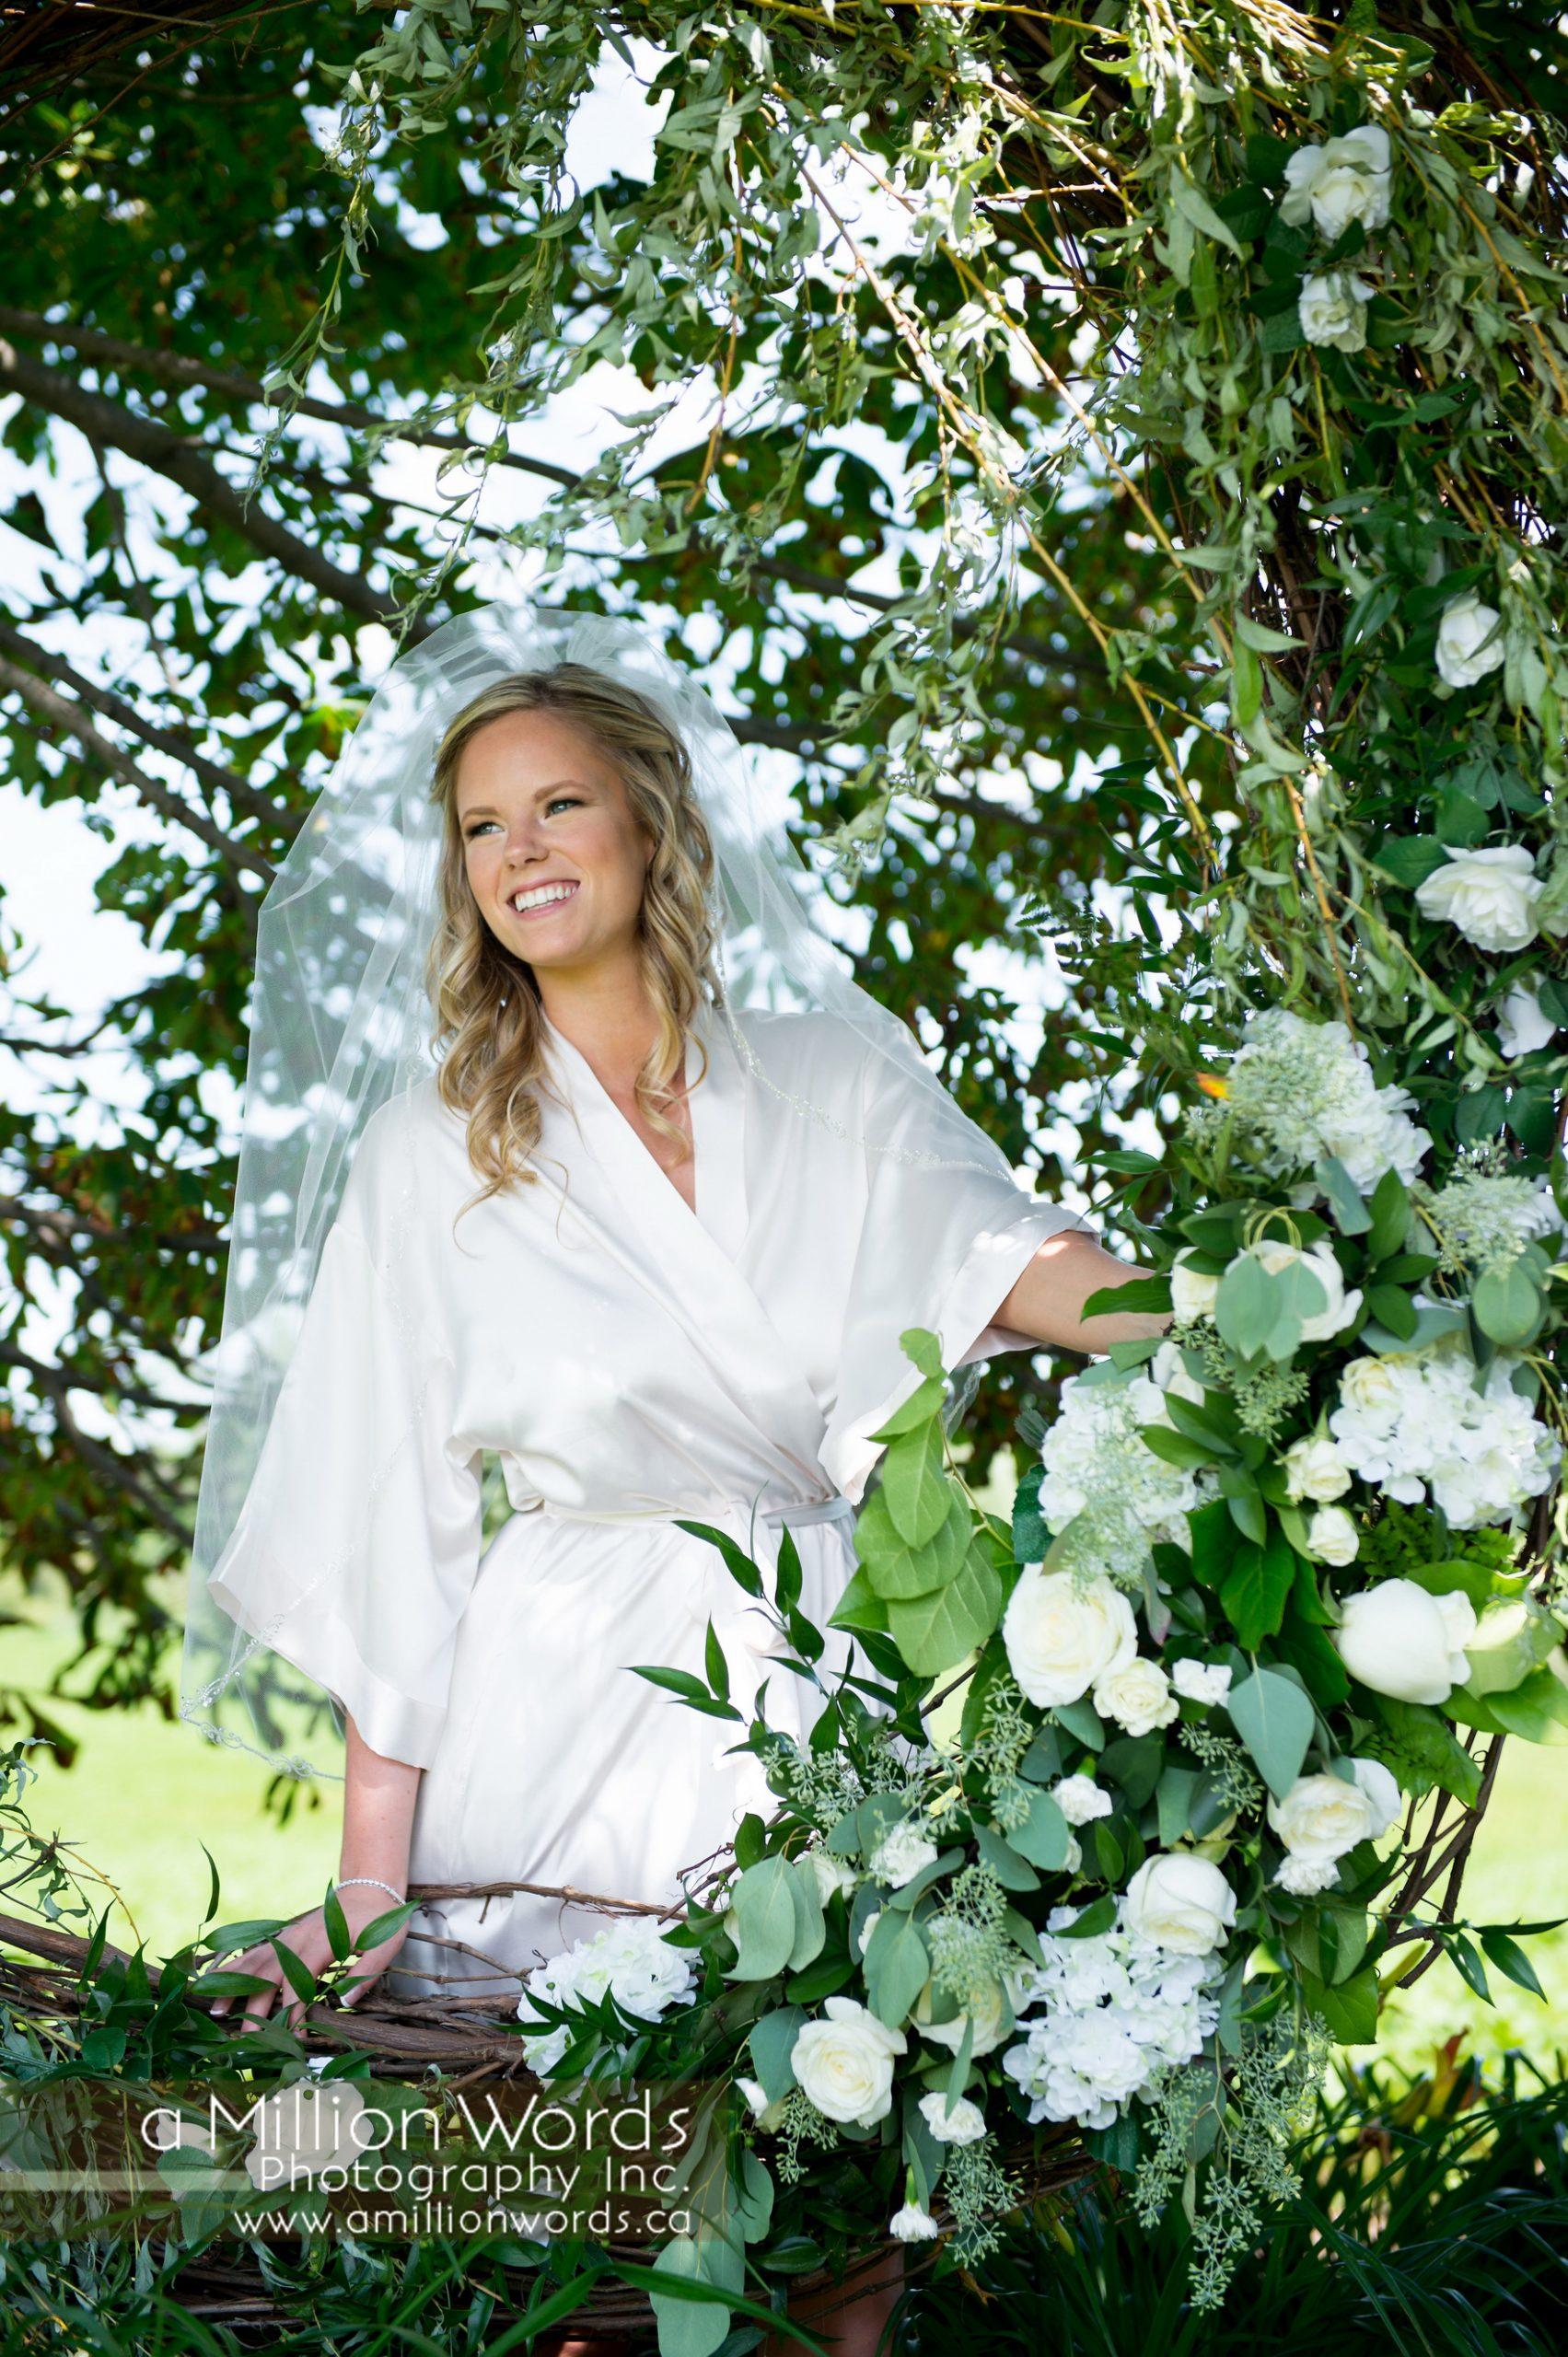 arthur_wedding_photographer14